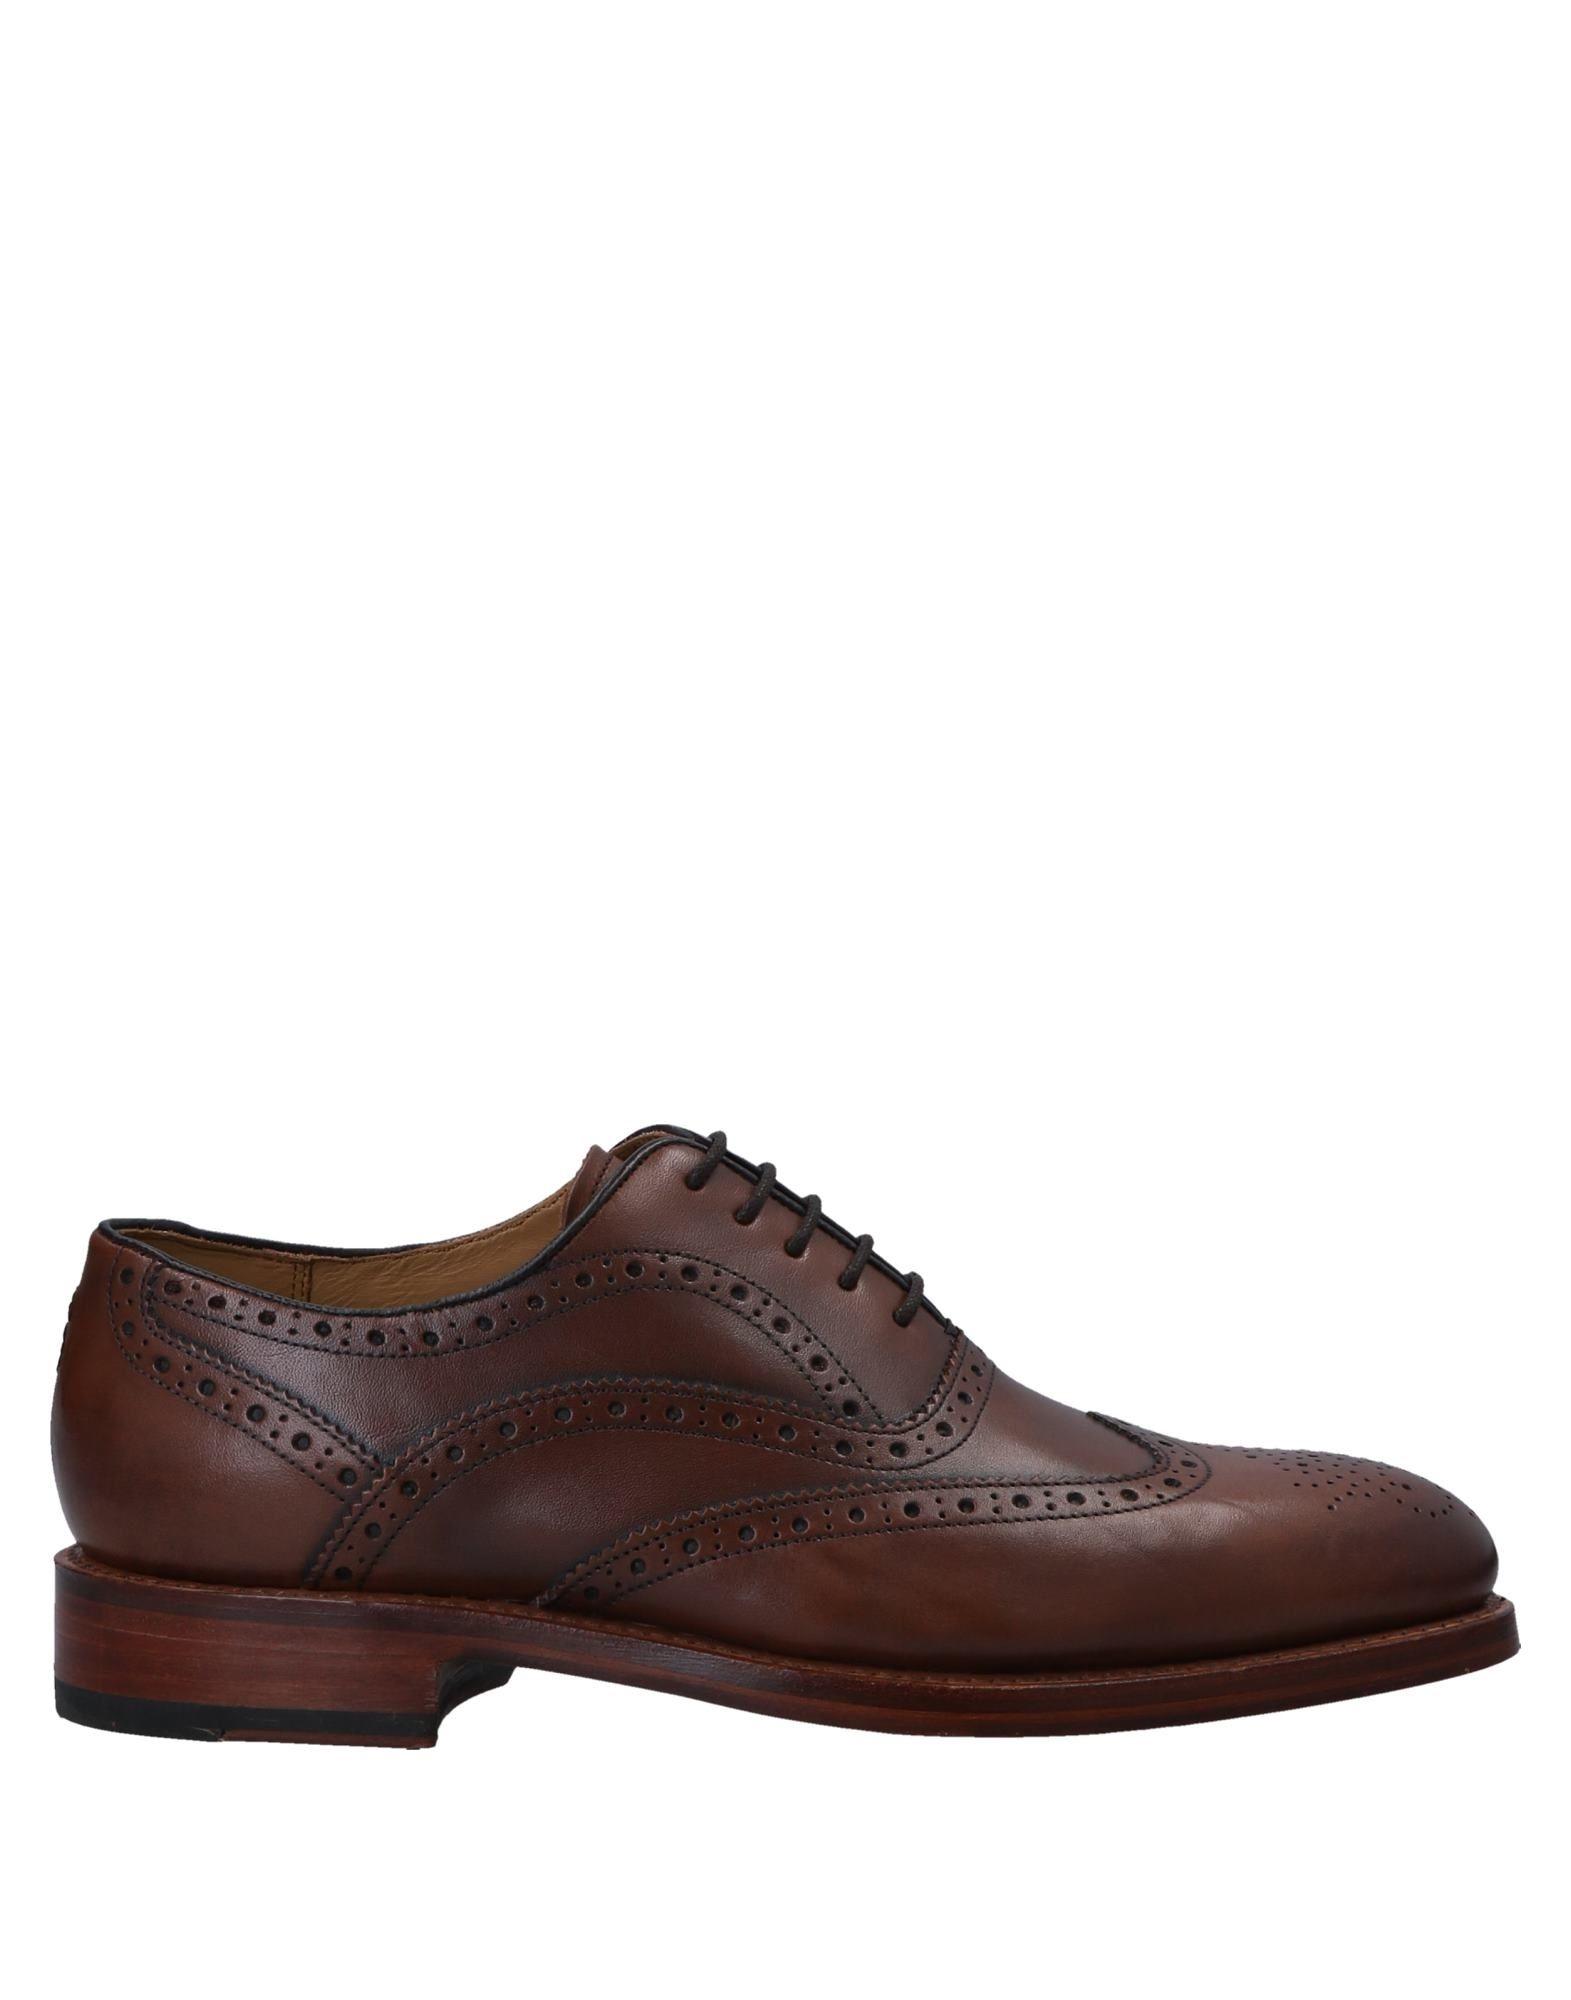 OLIVER SWEENEY Обувь на шнурках patrick j sweeney ii rfid for dummies